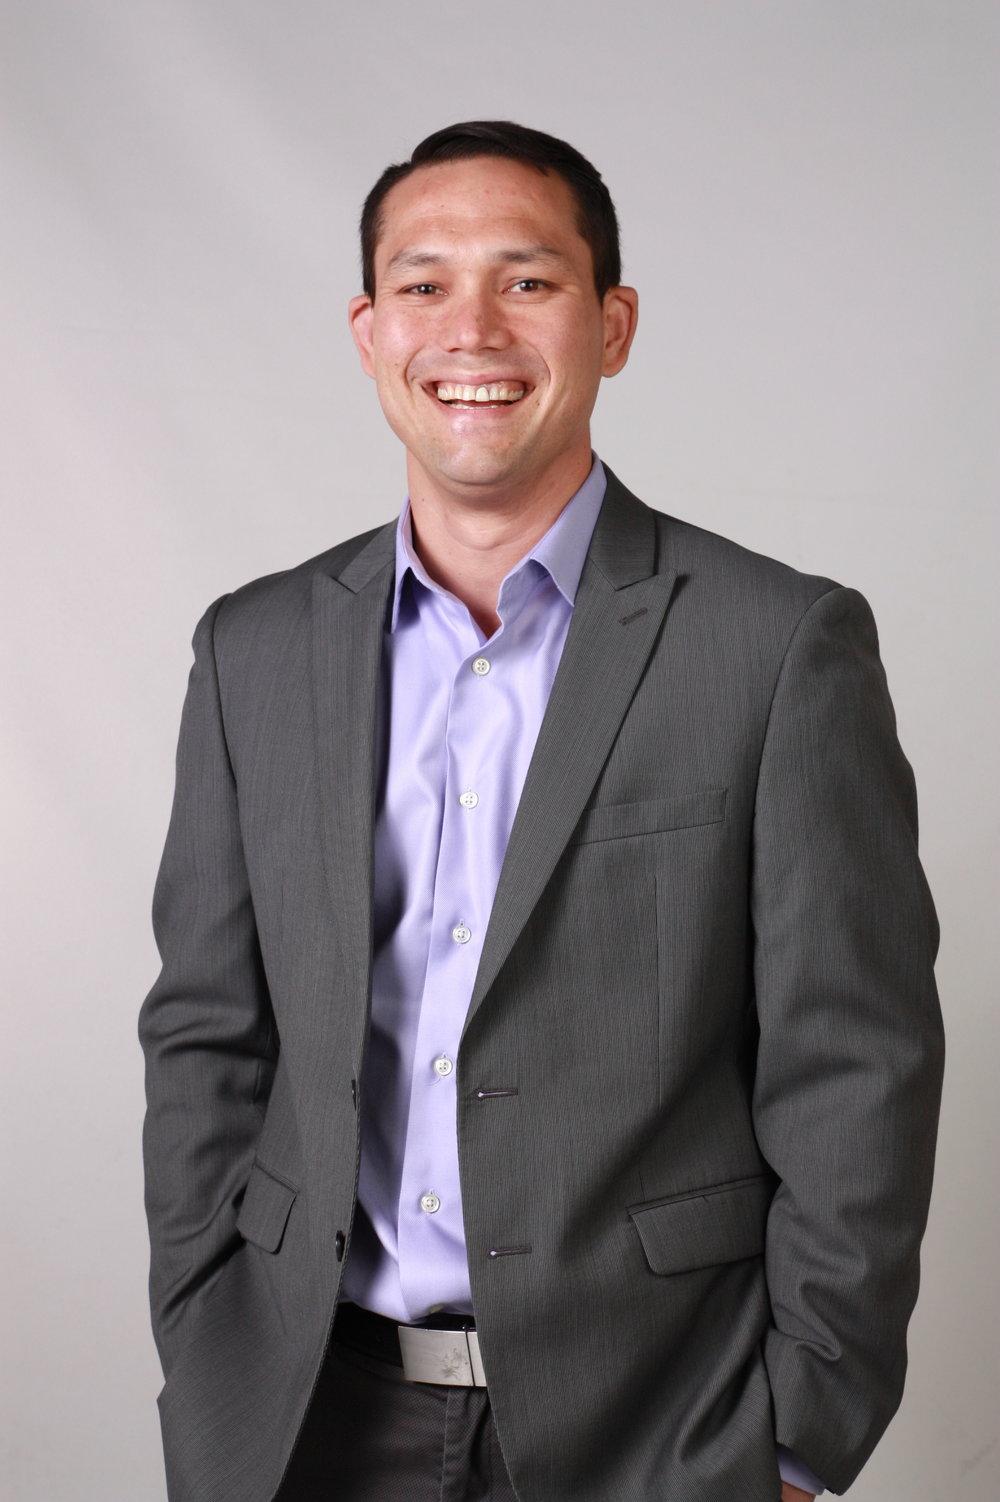 Michael Nesbitt